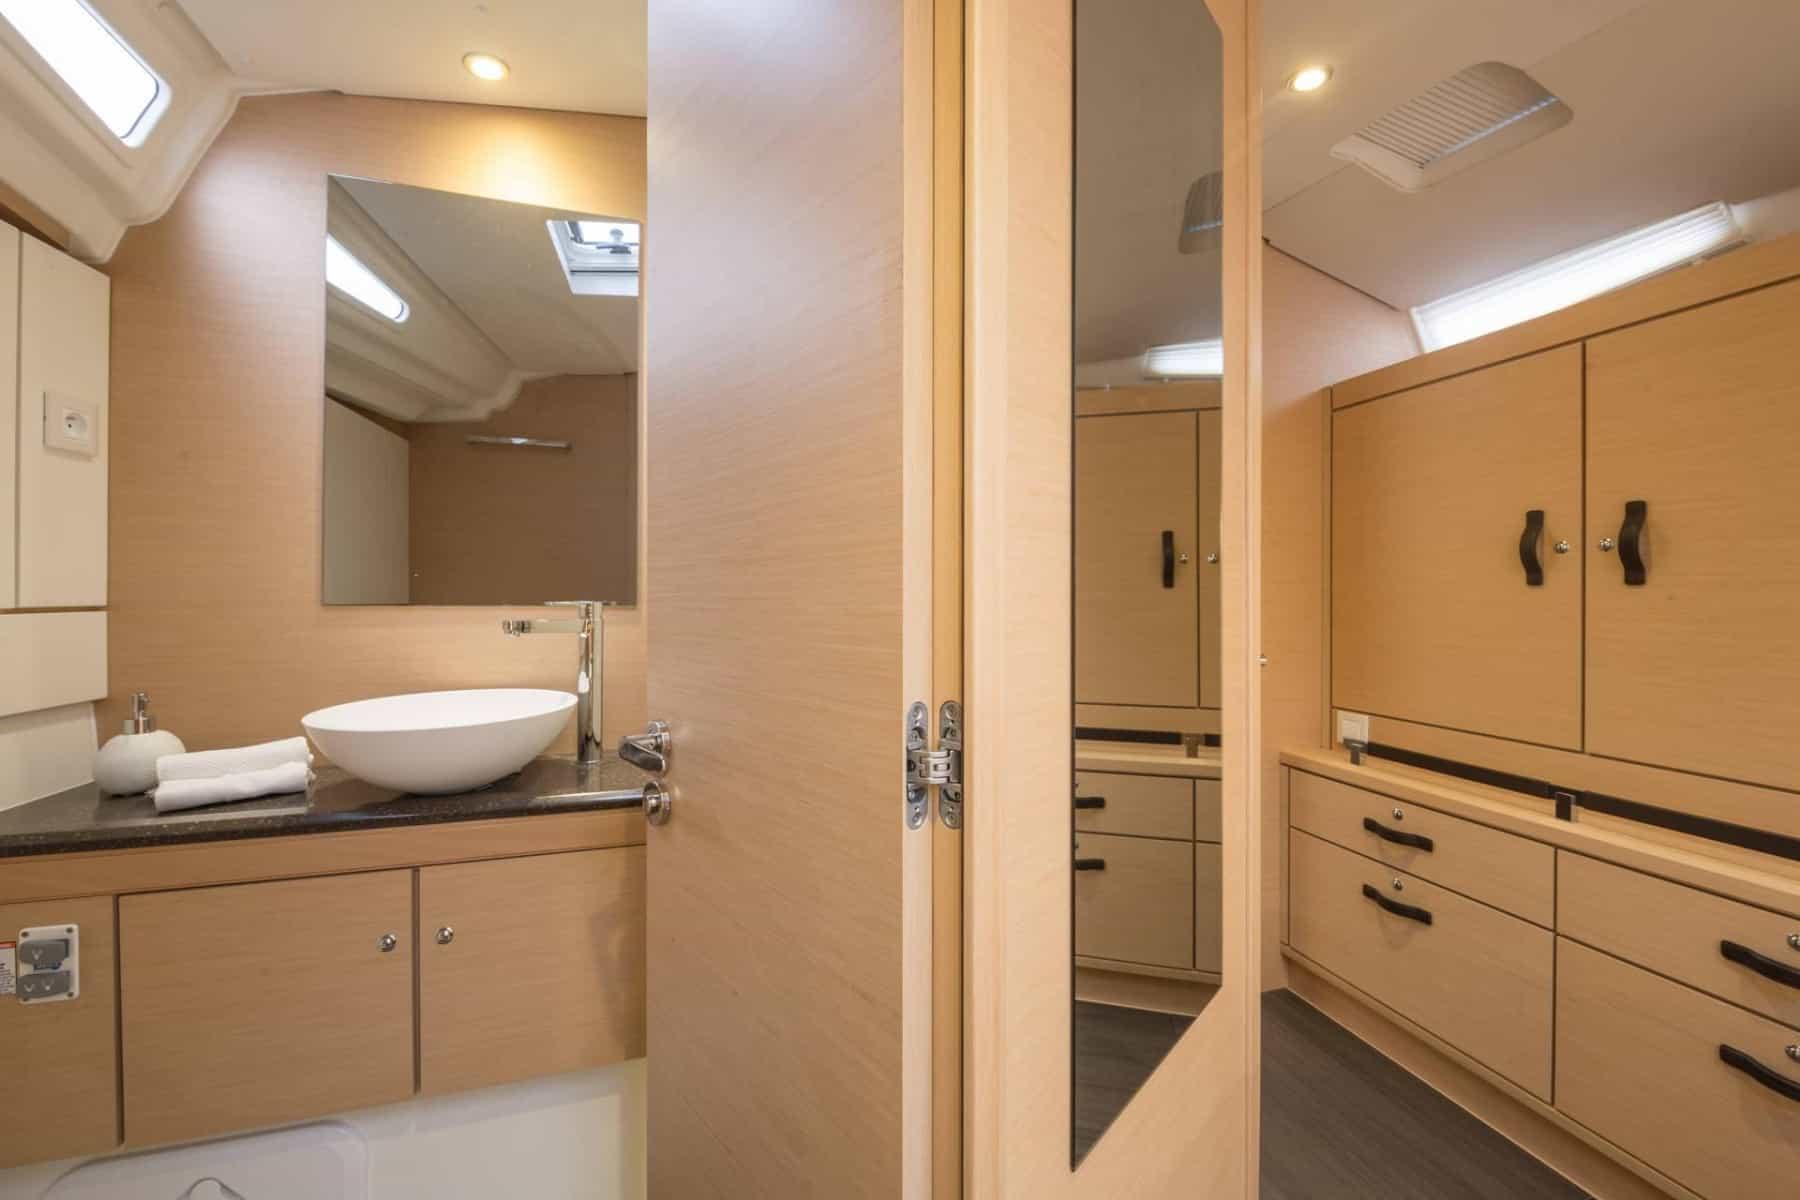 Jeanneau-54-interior-head-2-charter-ownership-yacht